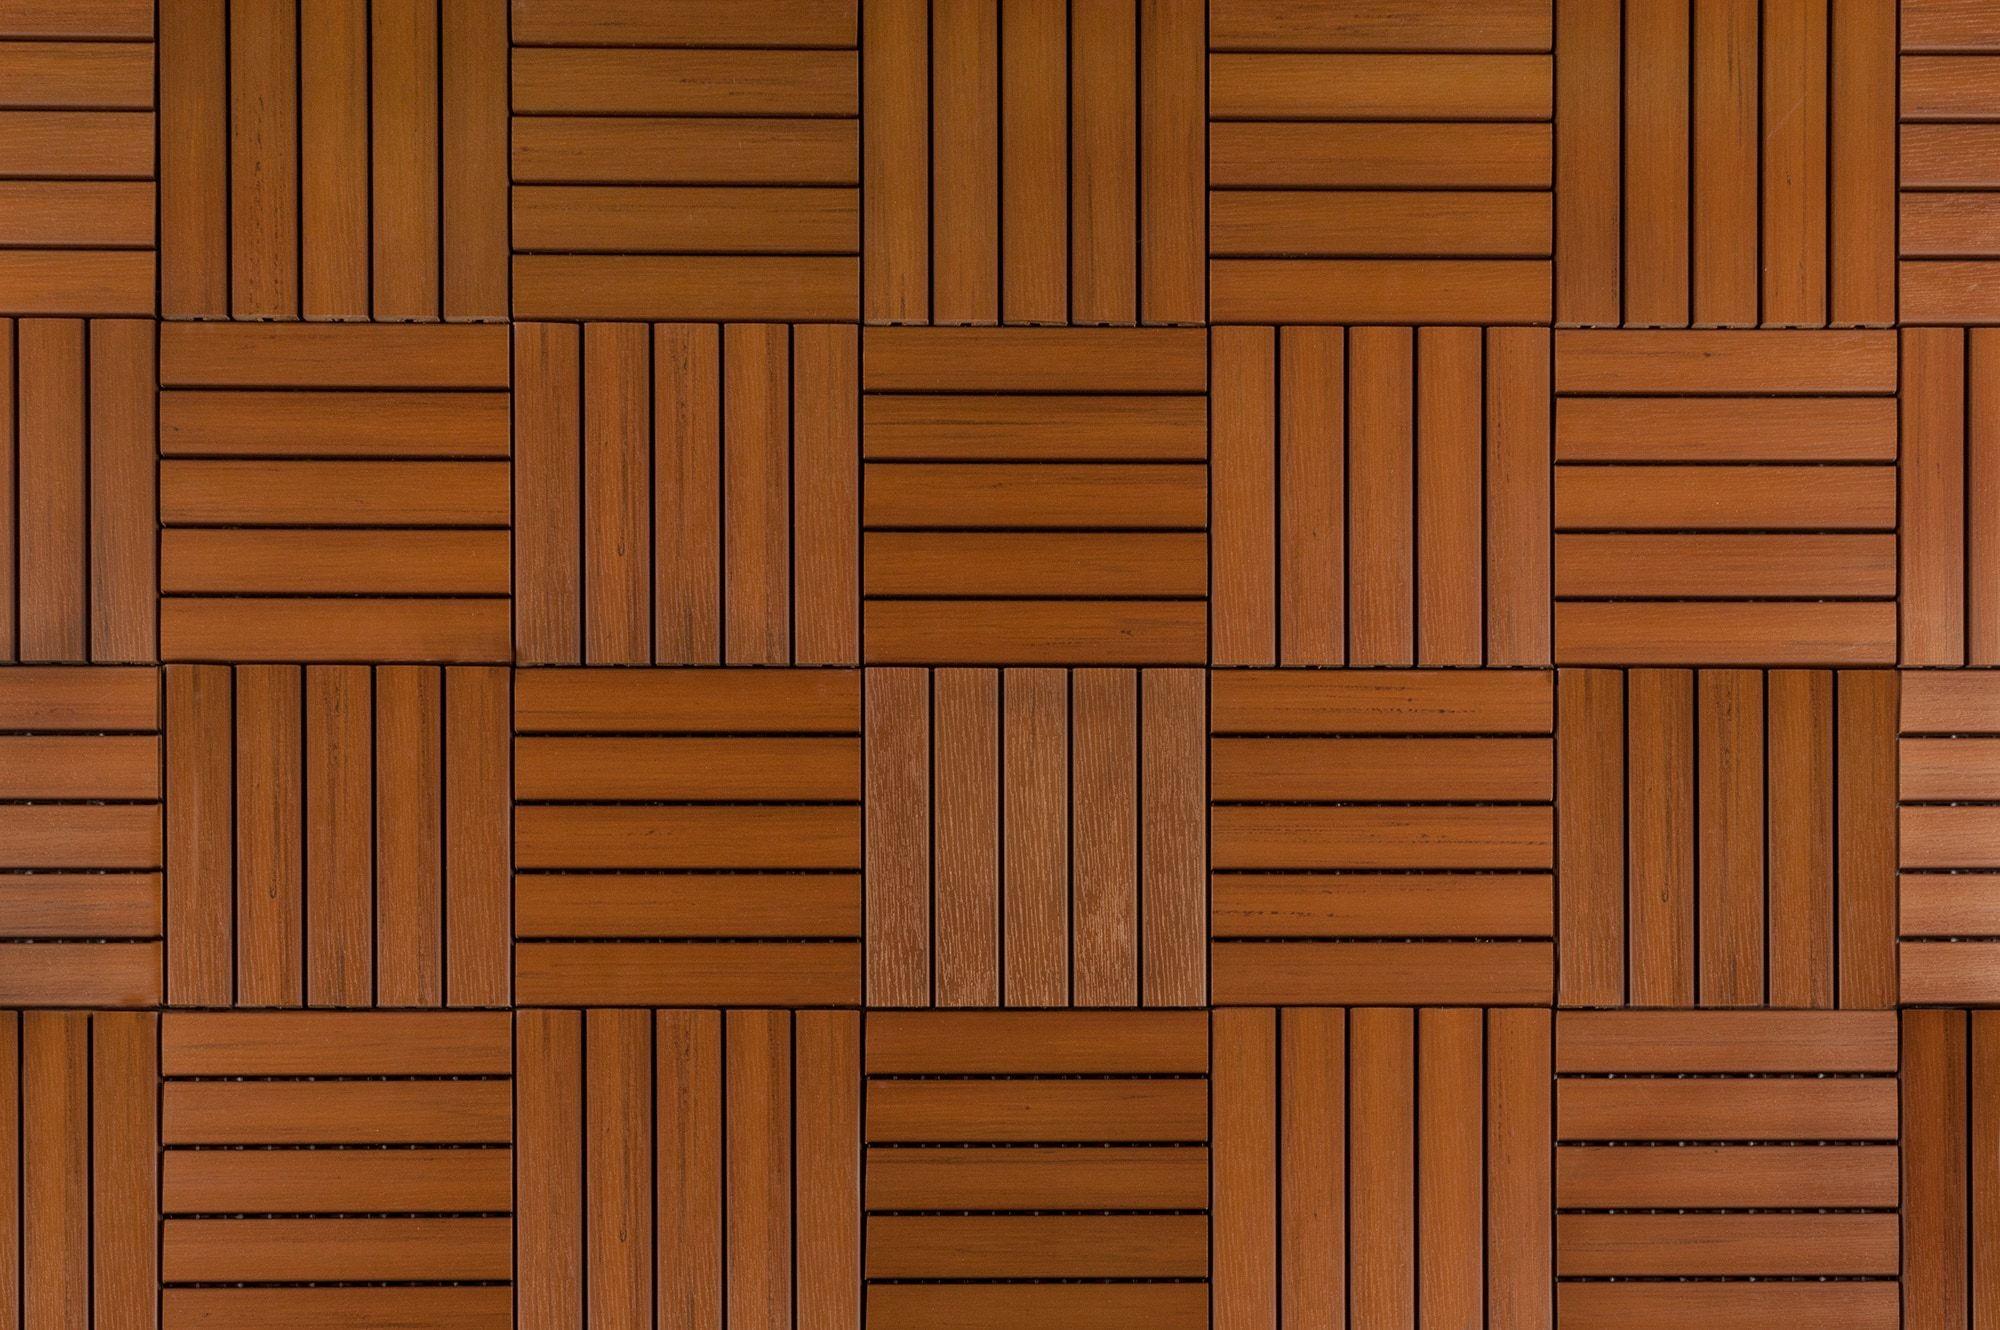 Builddirect 174 Kontiki Interlocking Deck Tiles Engineered Polymer Series